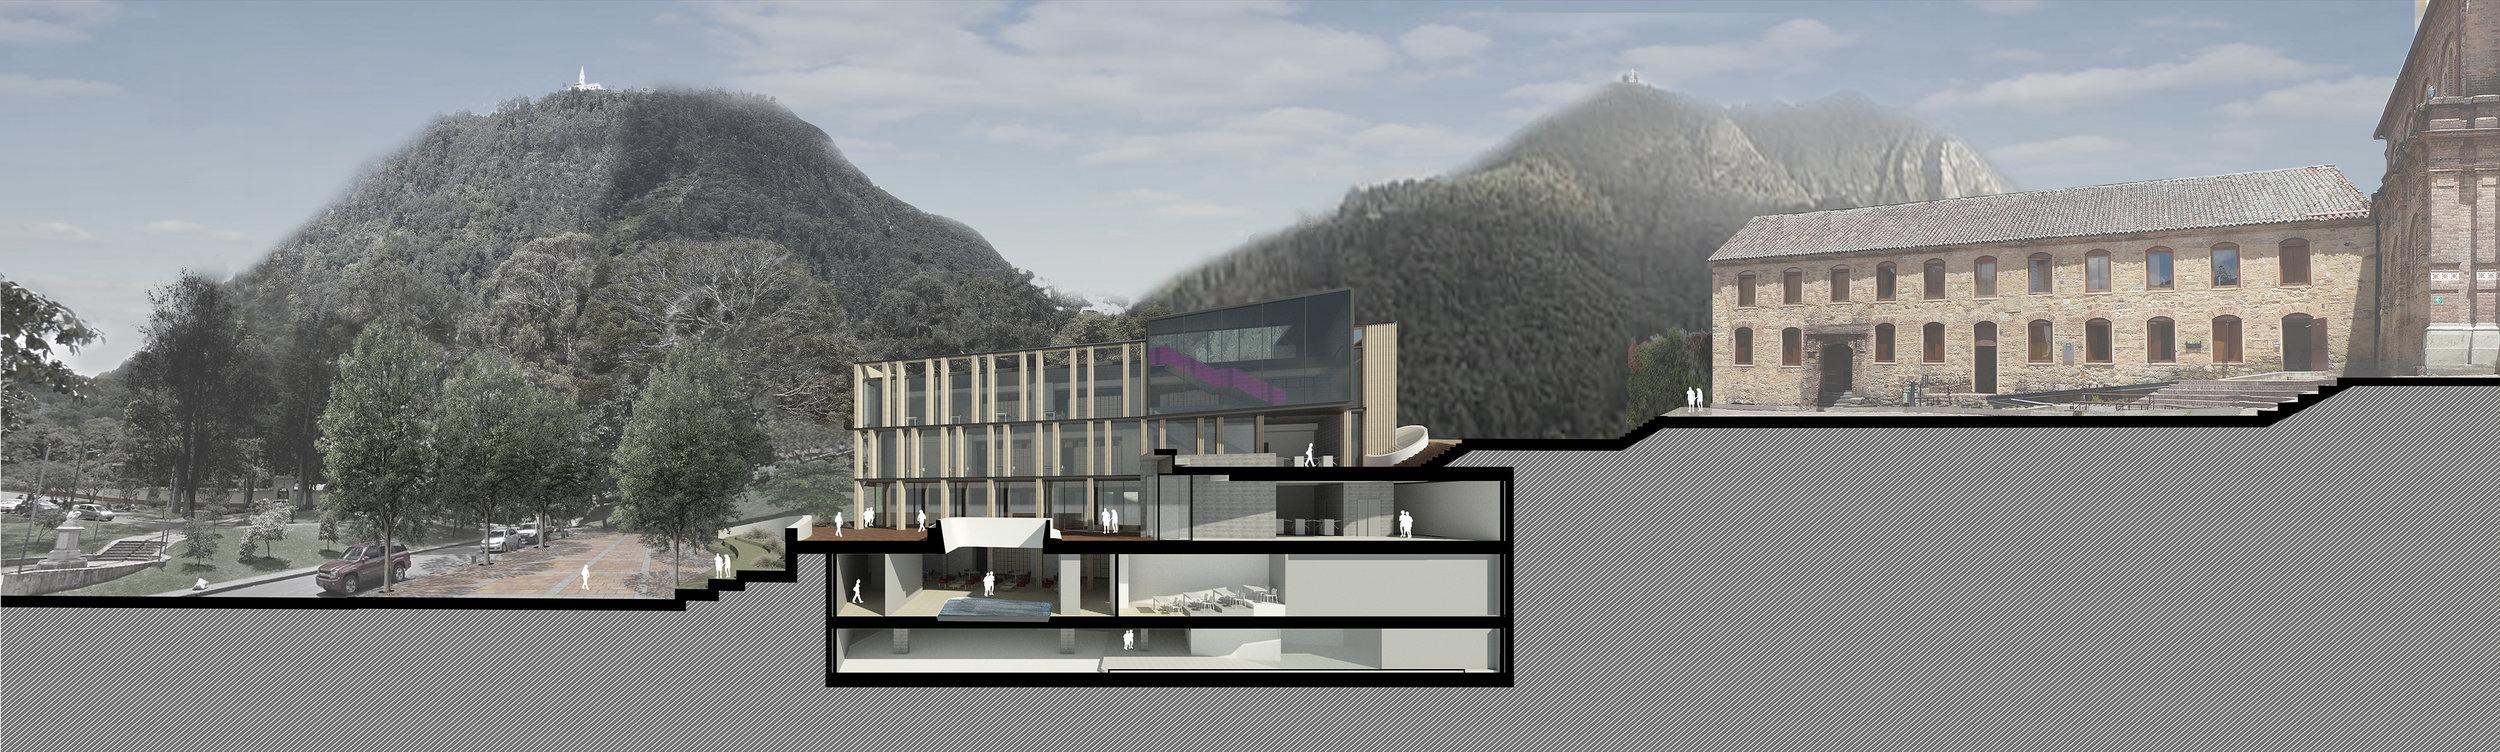 rir-arquitectos-uniandes-bolivariana-16.jpg